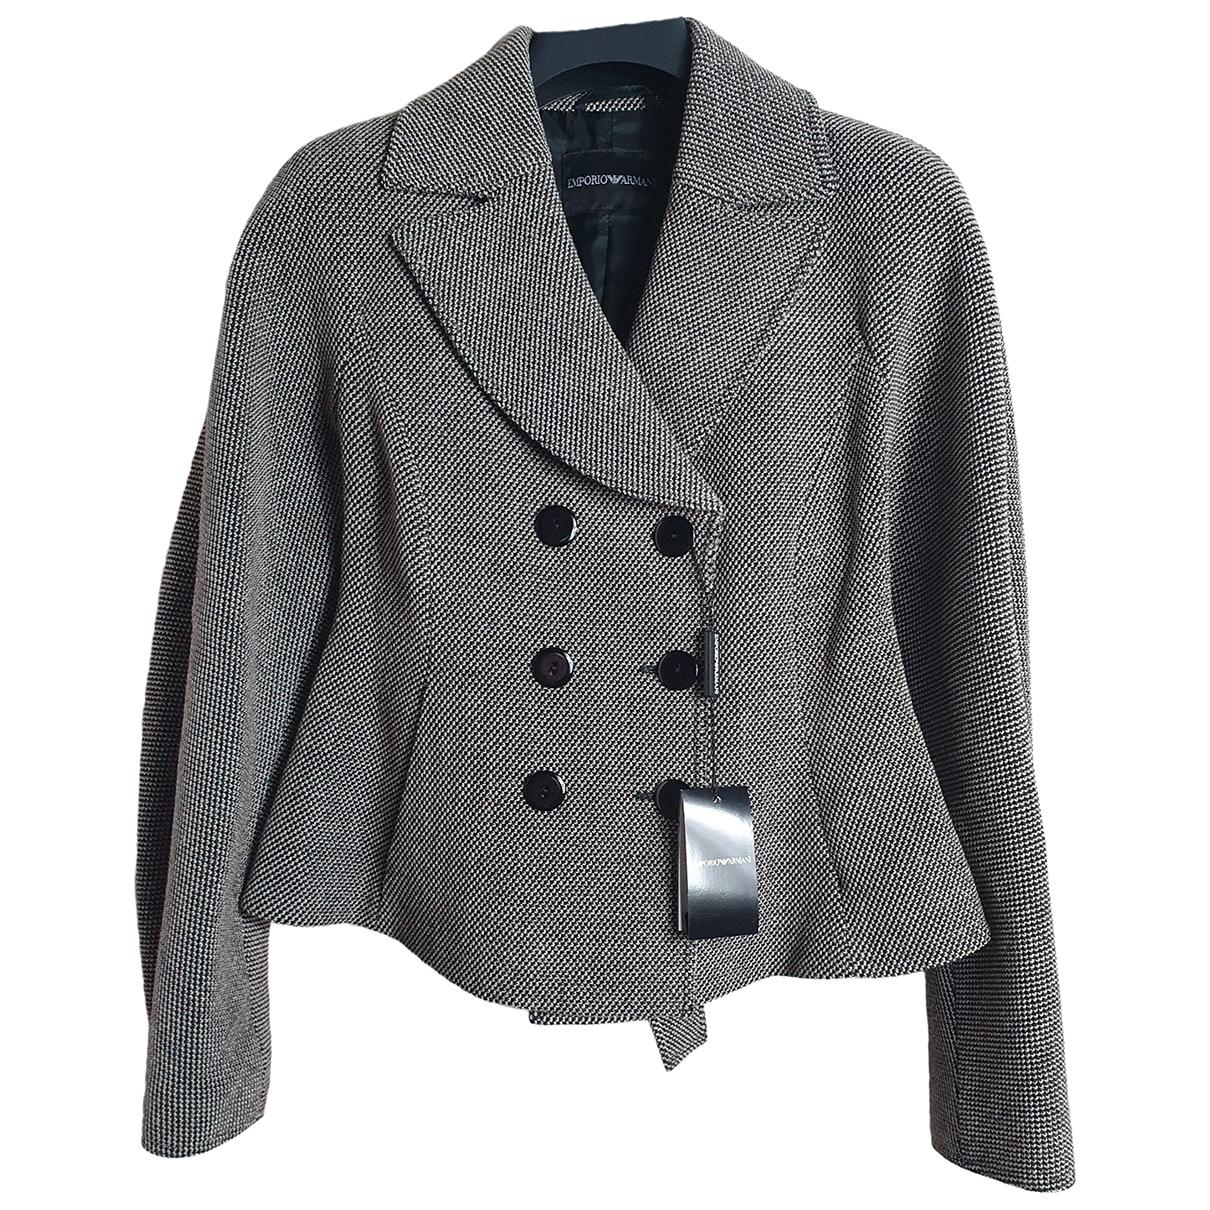 Emporio Armani \N Jacke in  Beige Wolle